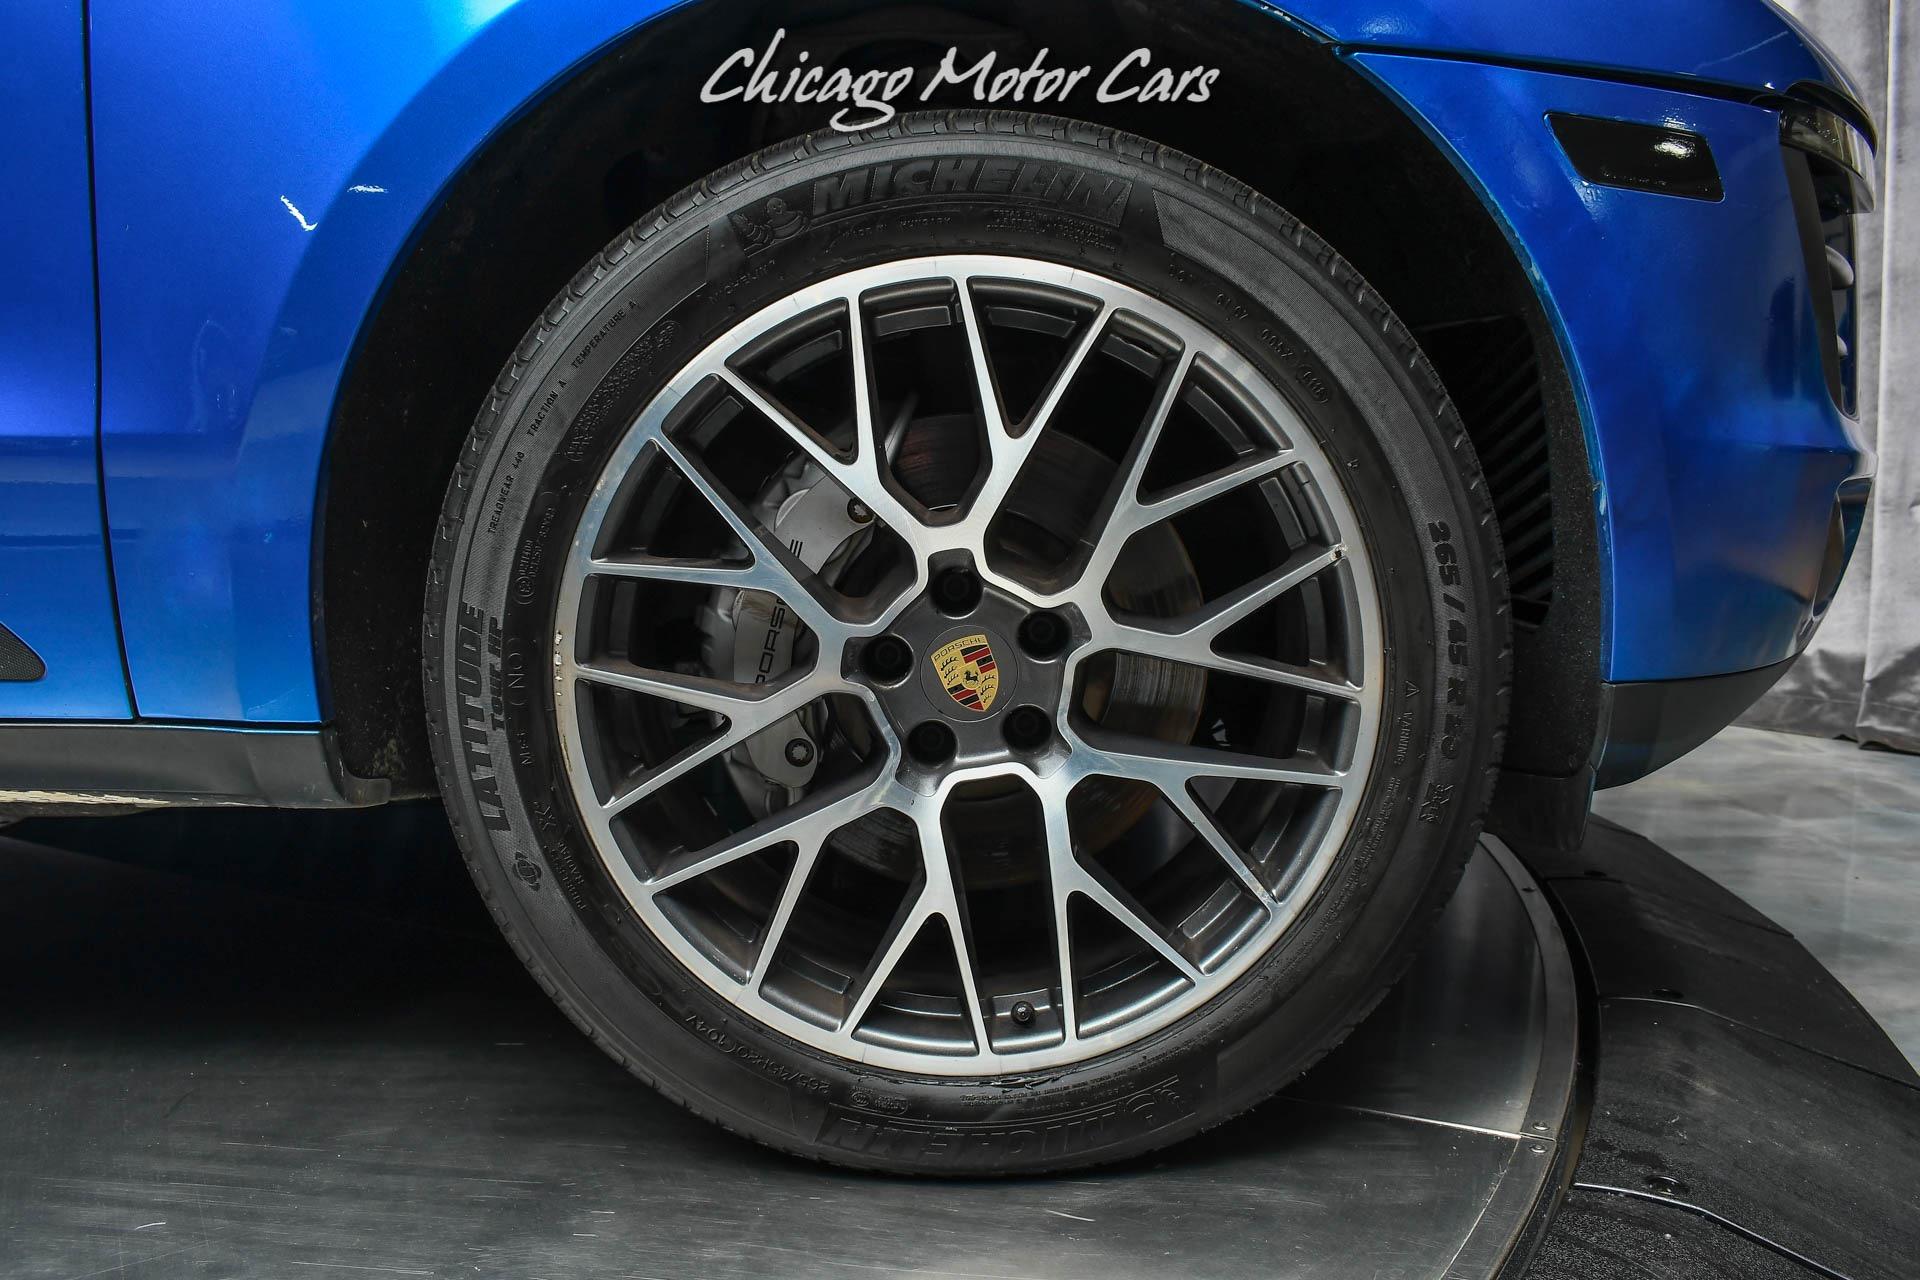 Used-2015-Porsche-Macan-S-65kMSRP-RS-Design-Wheels-Premium-Package-Plus-BOSE